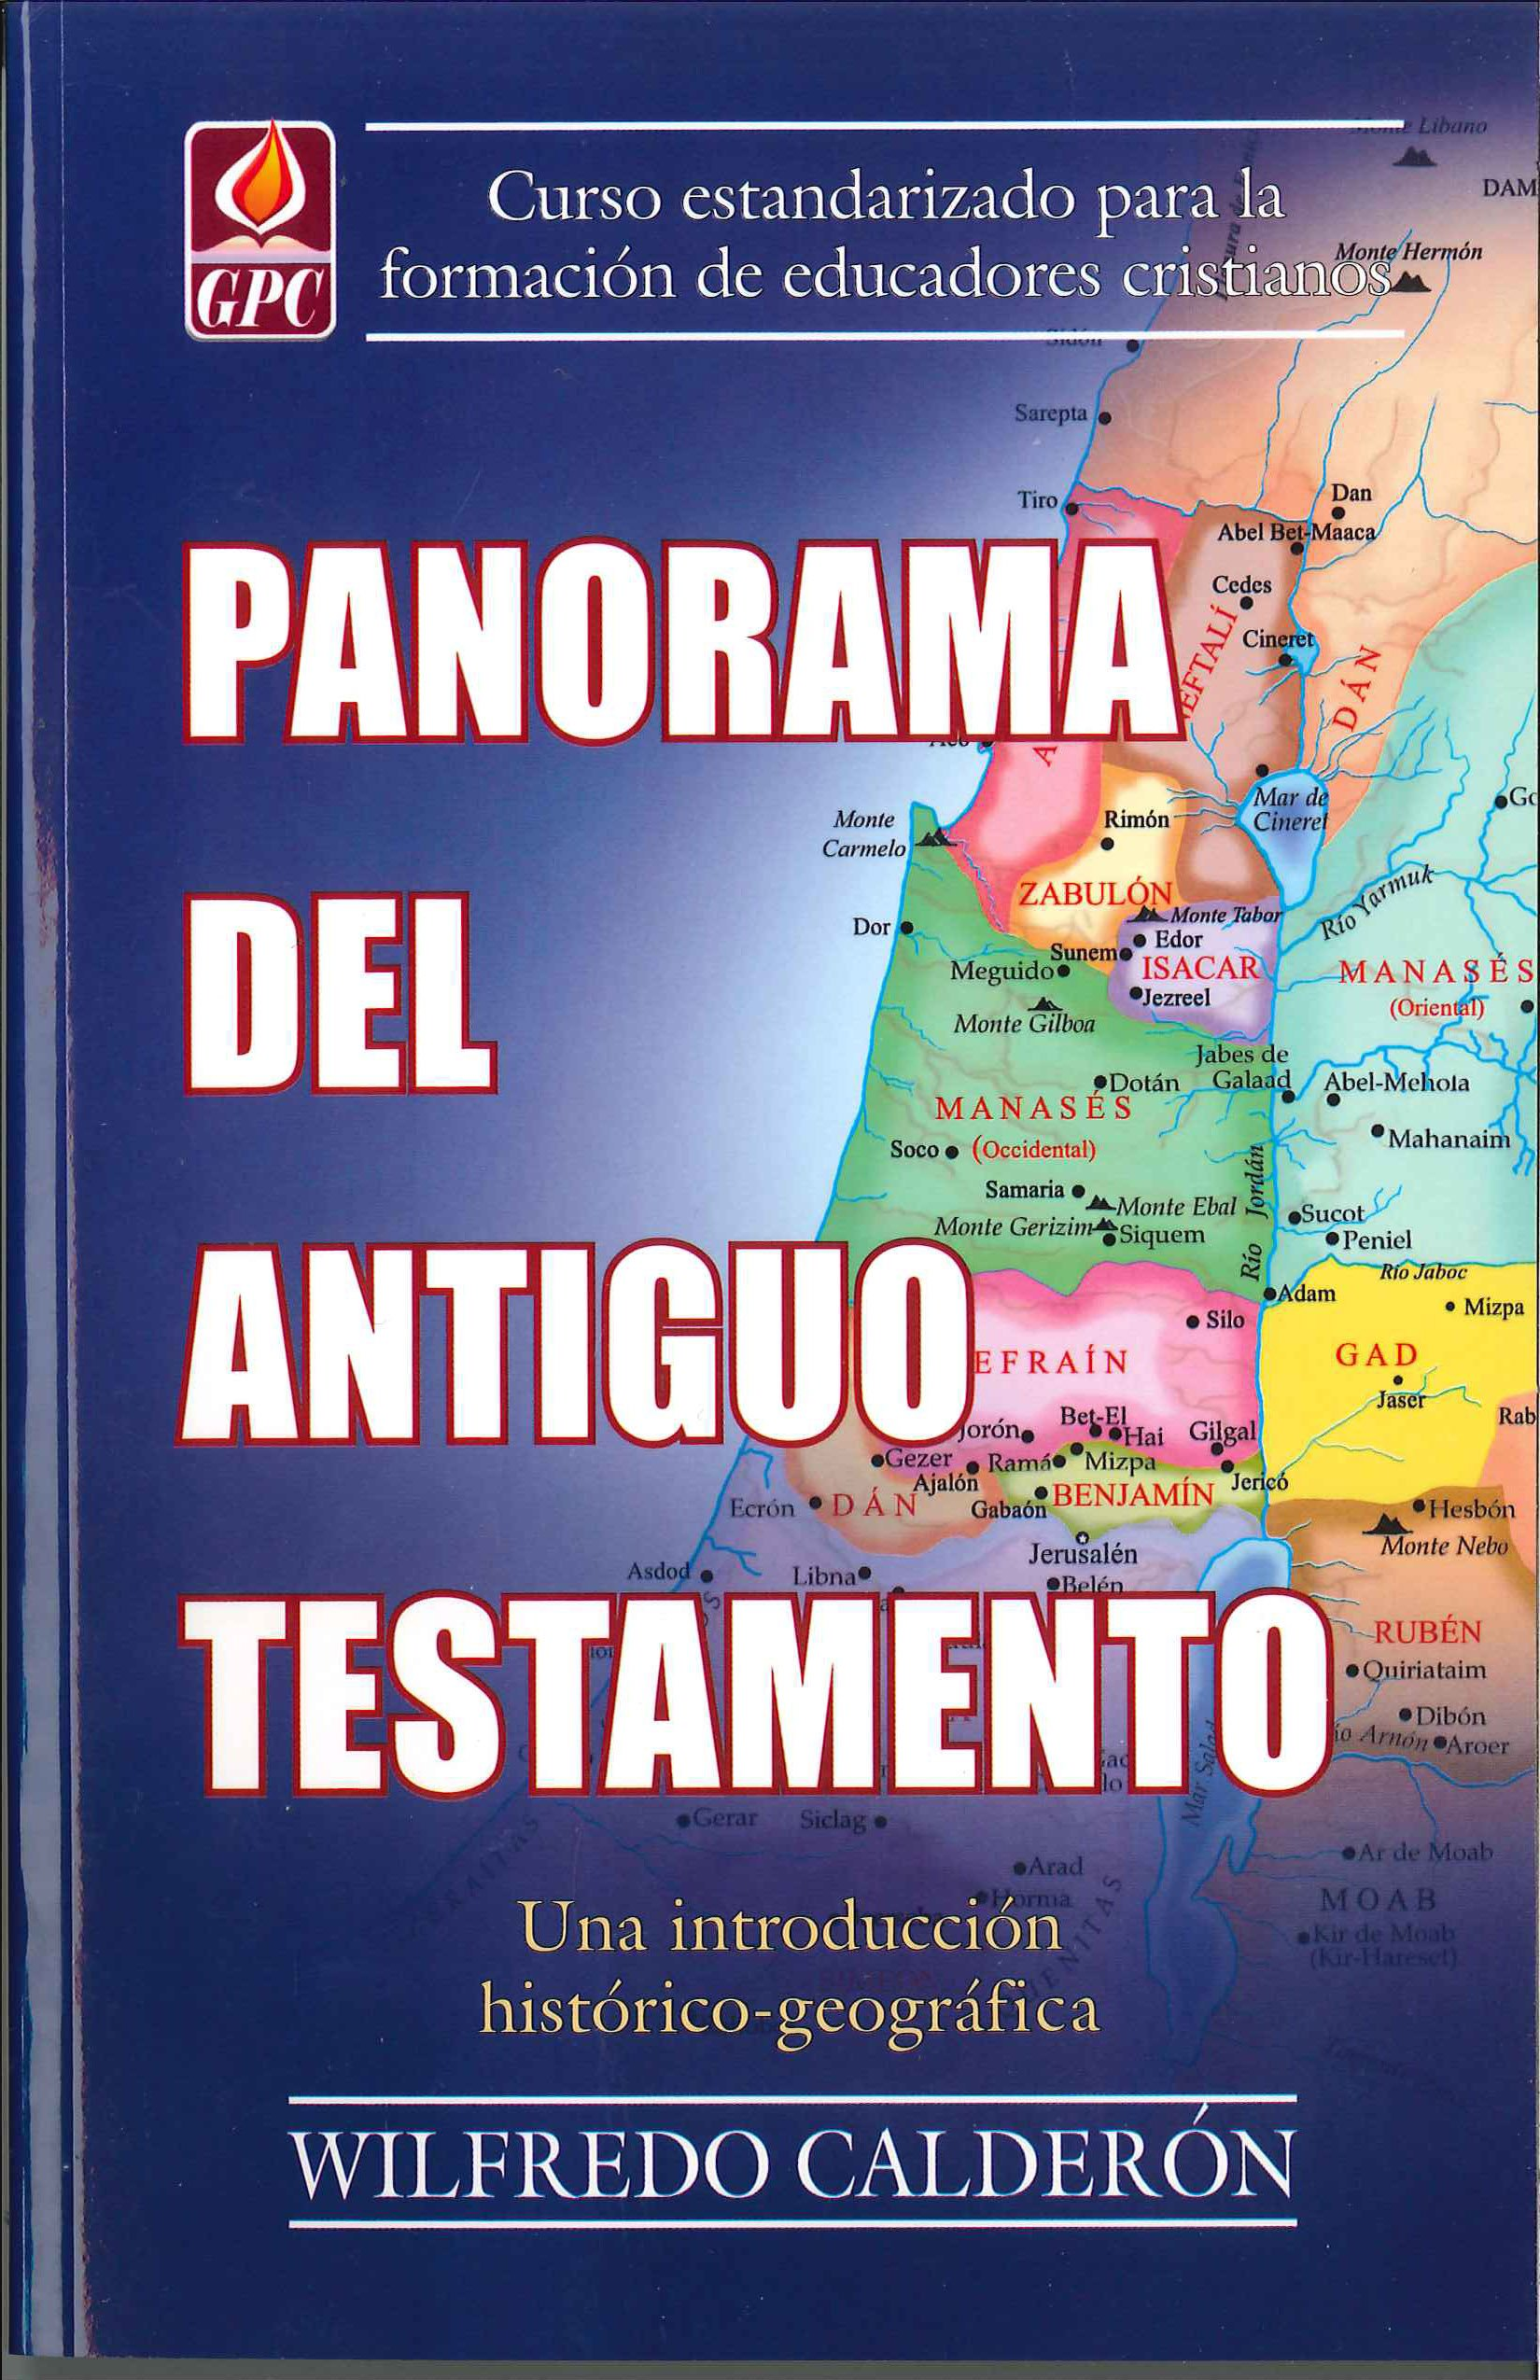 Panorama Del Nuevo Testamento Wilfredo Calderon Pdf